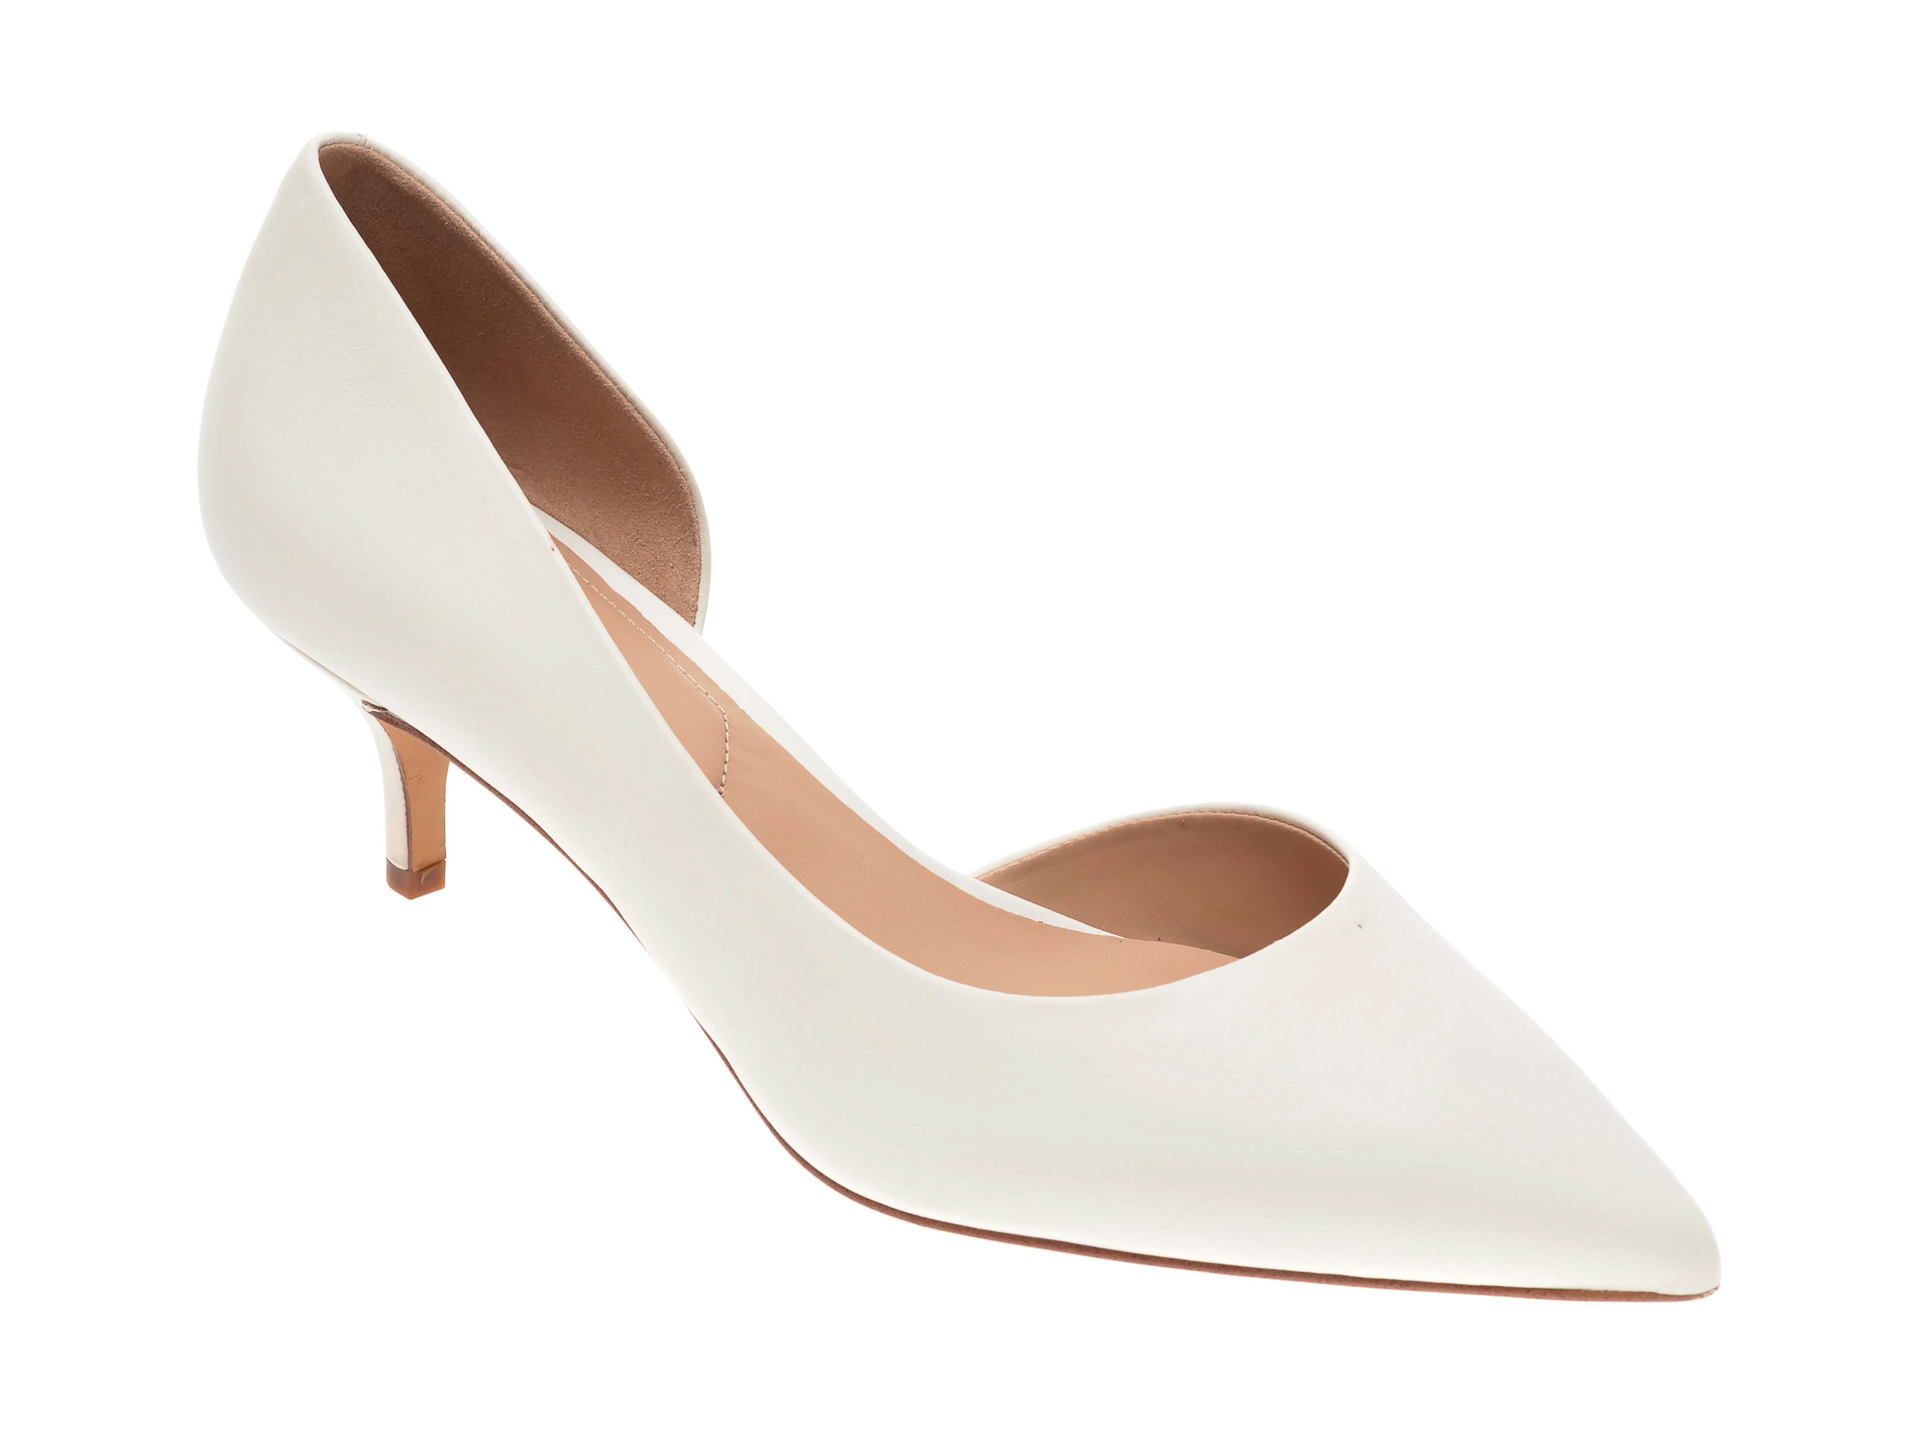 Pantofi ALDO albi, Nyderindra100, din piele naturala imagine